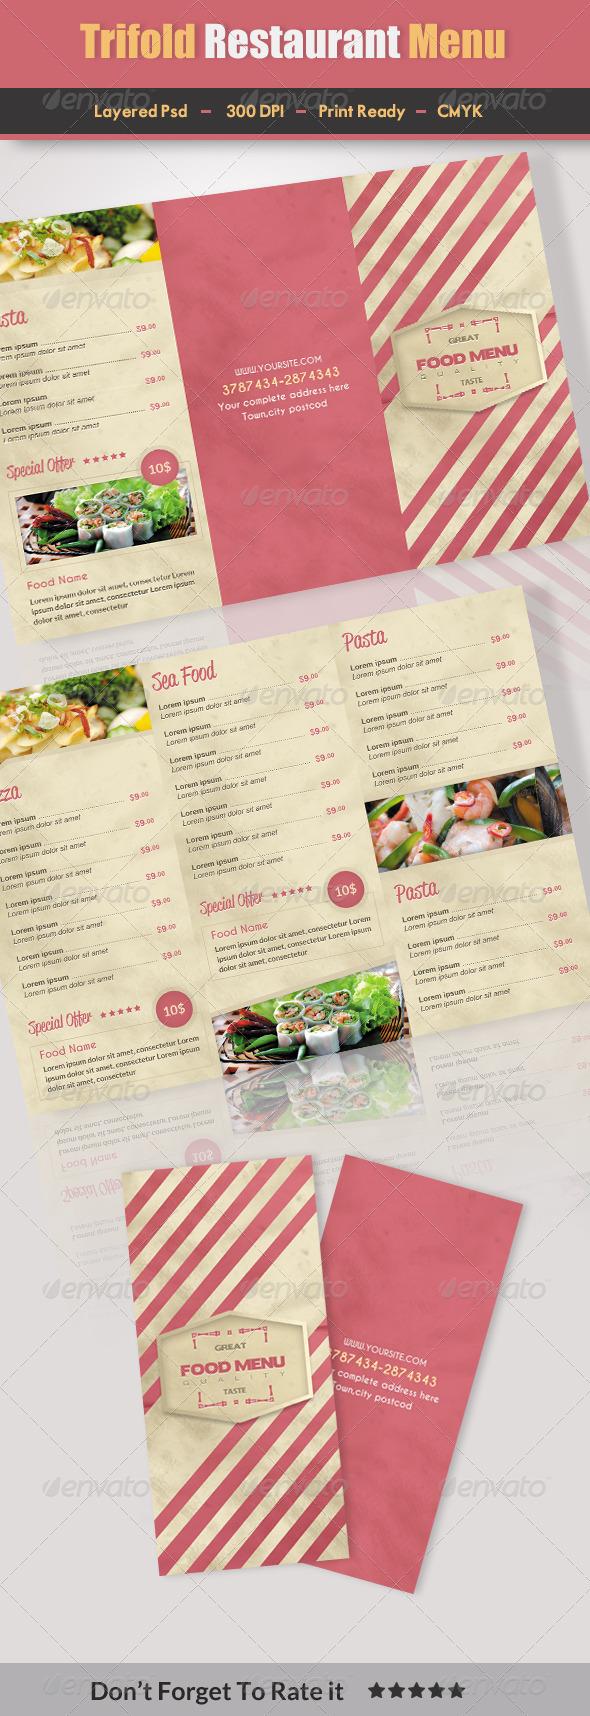 Trifold Restaurant Menu 2